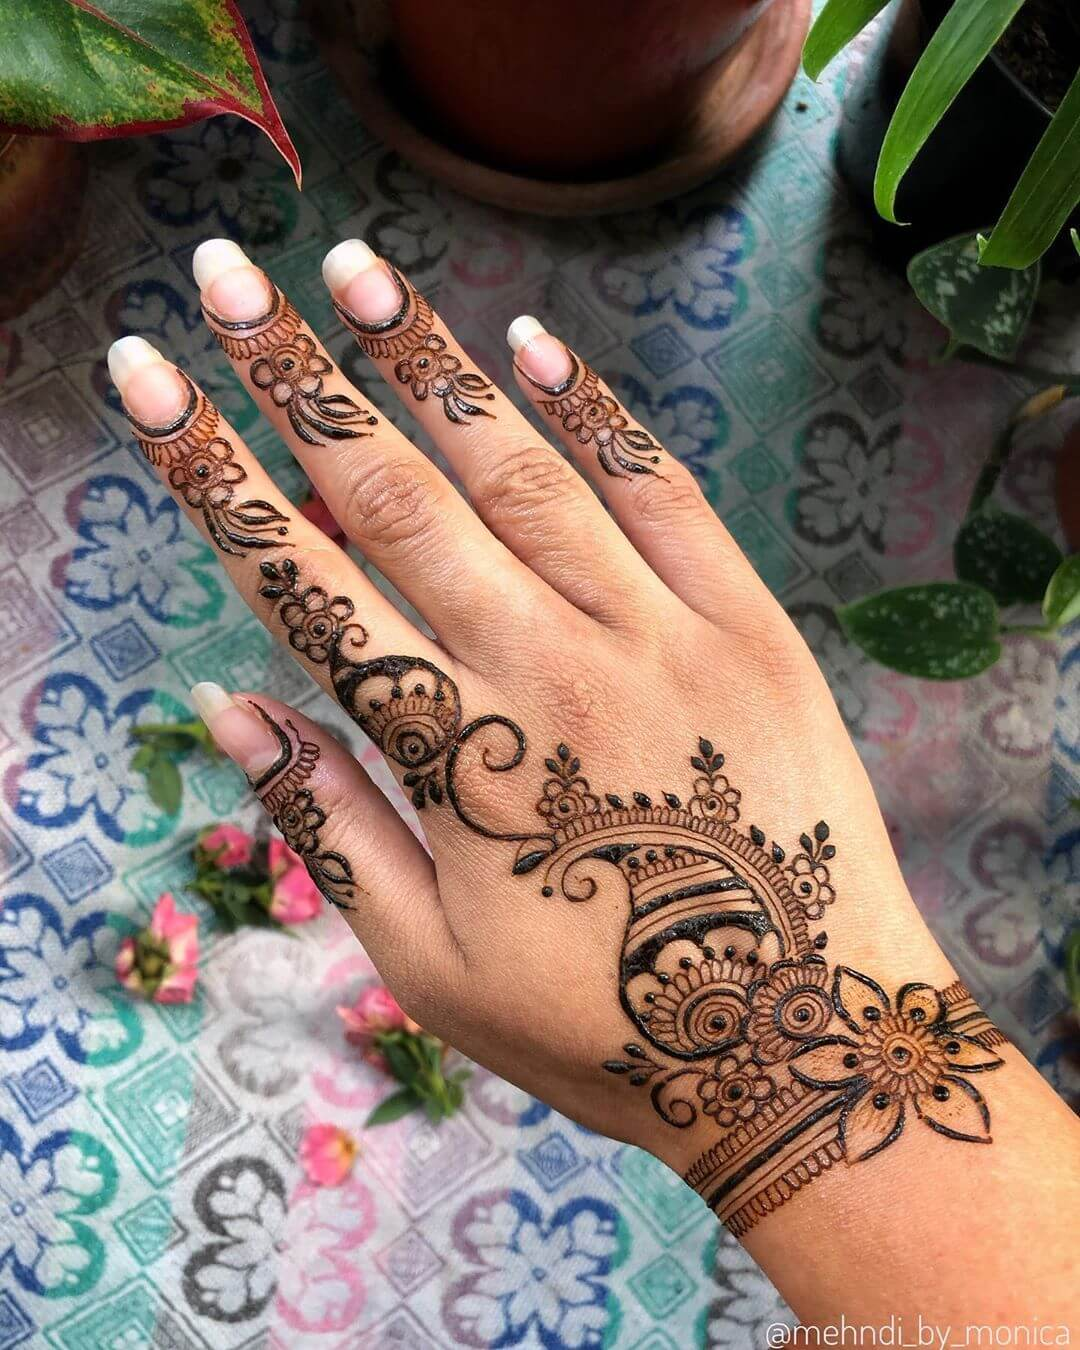 Basic Arabic kerala Mylanchi mehandi Designs For Back Hand